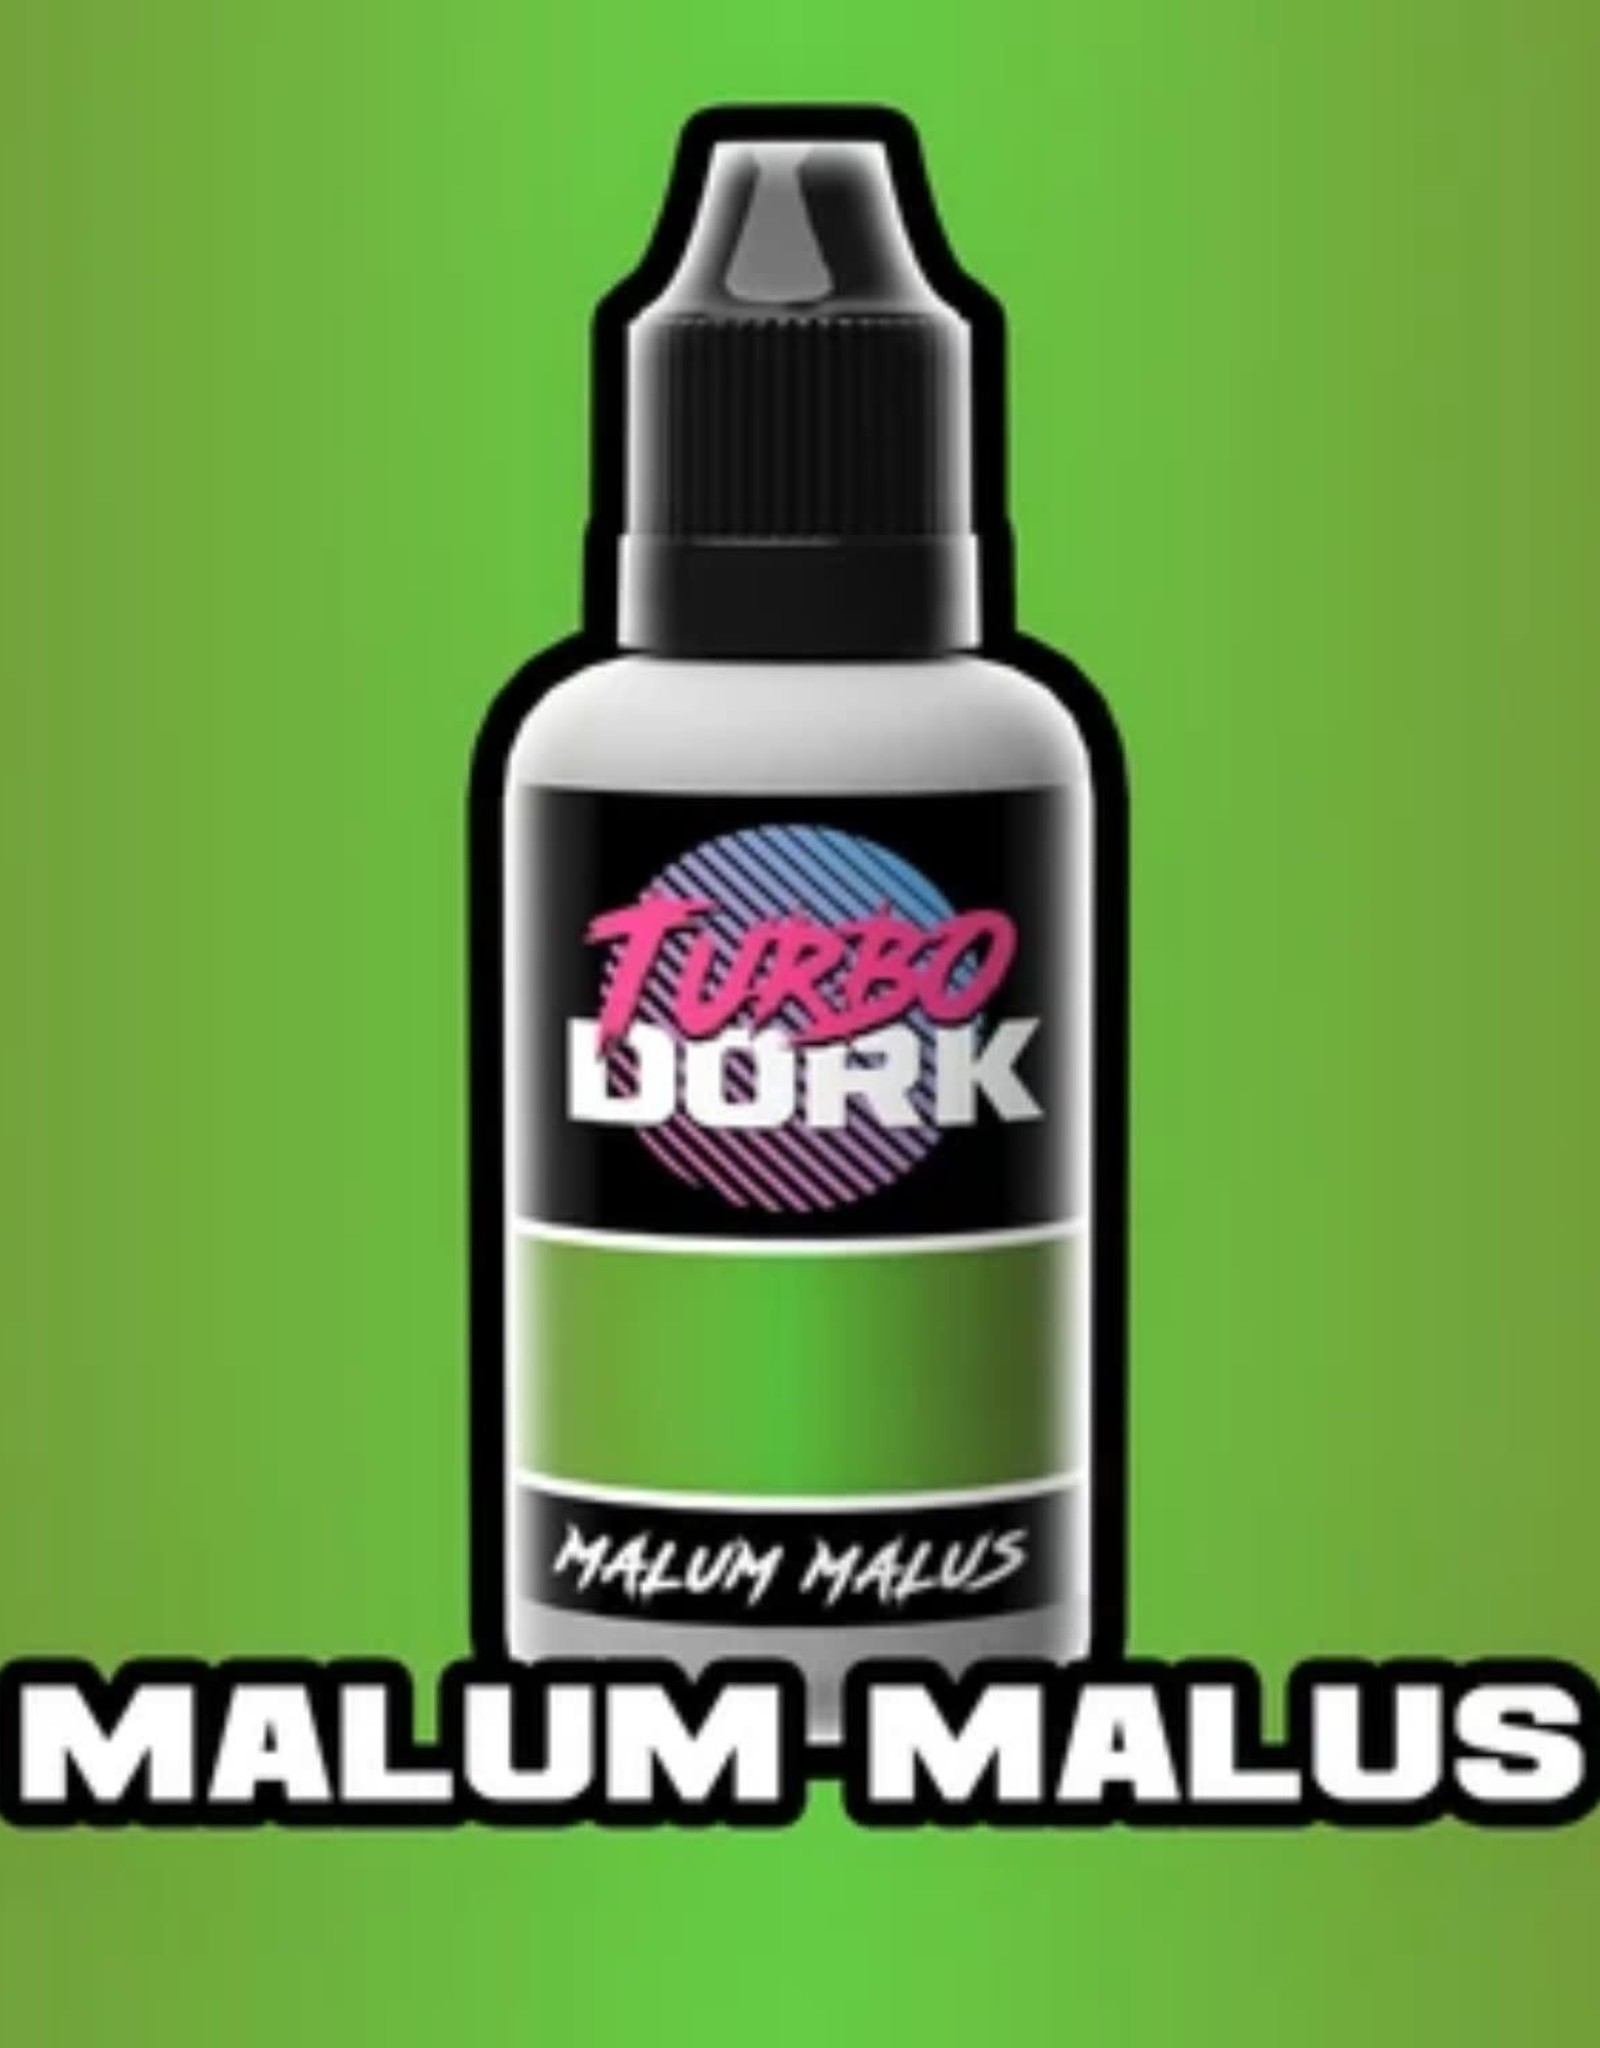 Turbo Dork Malum Malus - Metallic